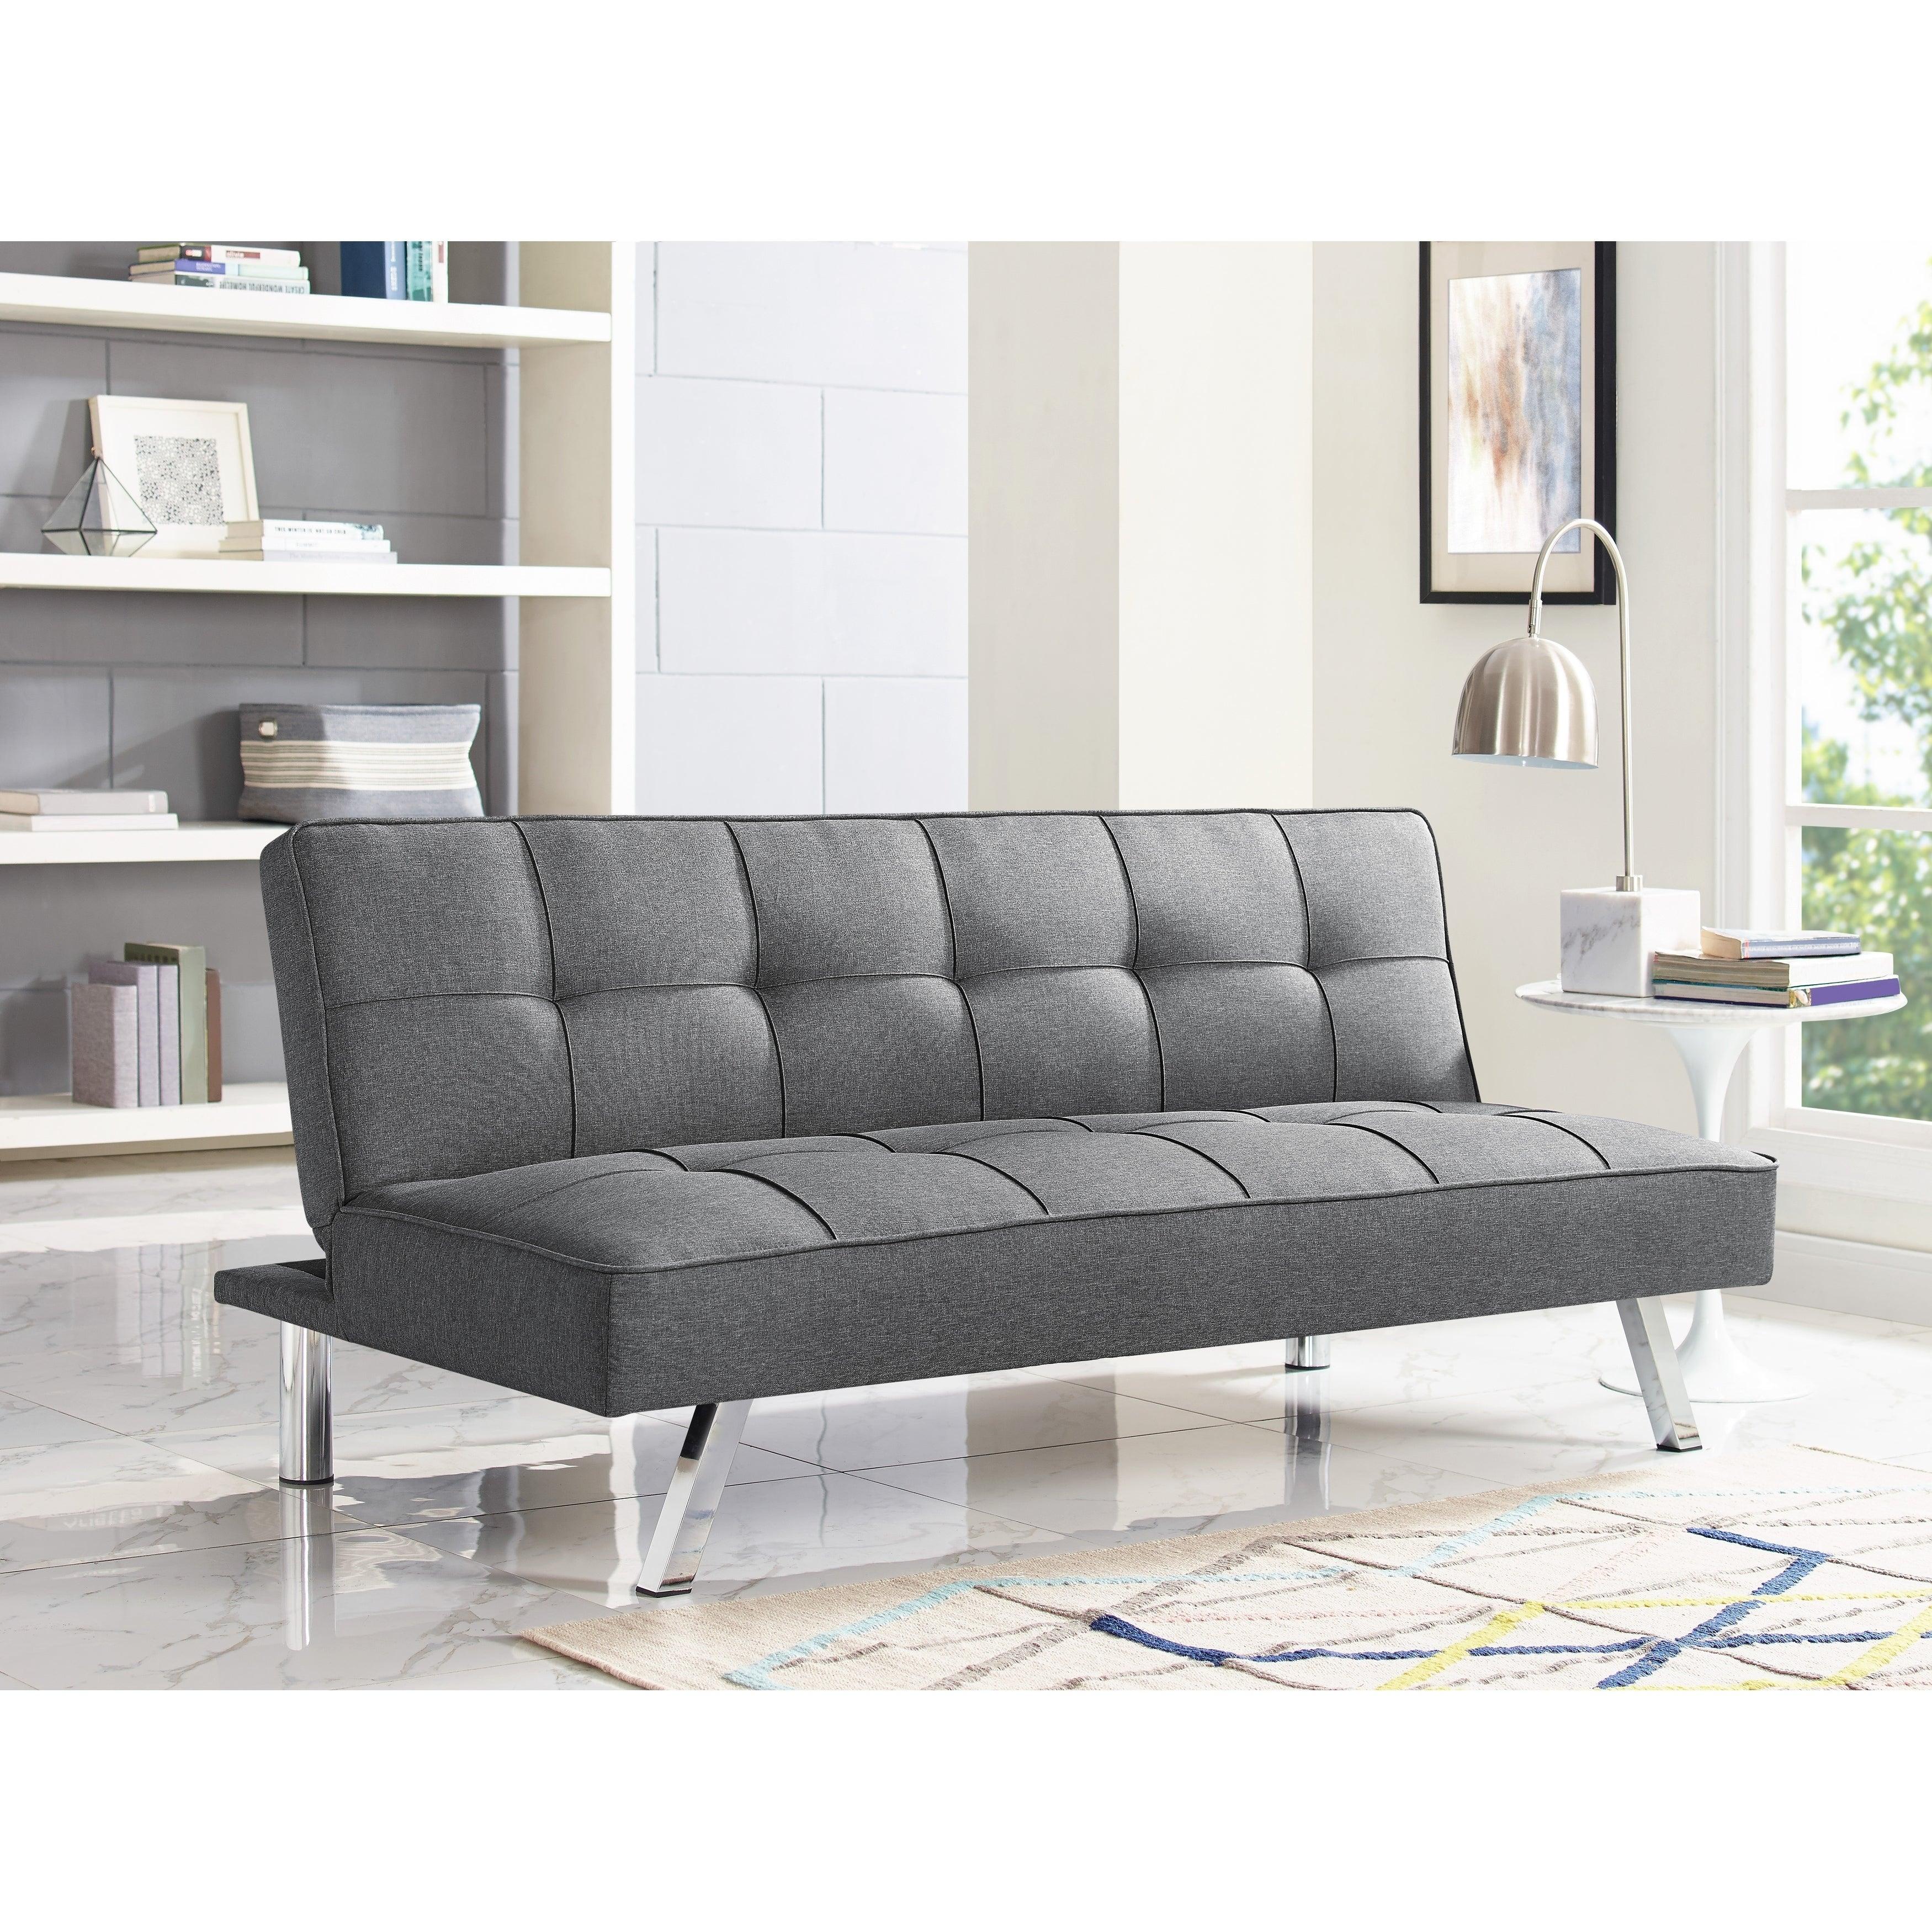 Serta Charlie Convertible Sofa